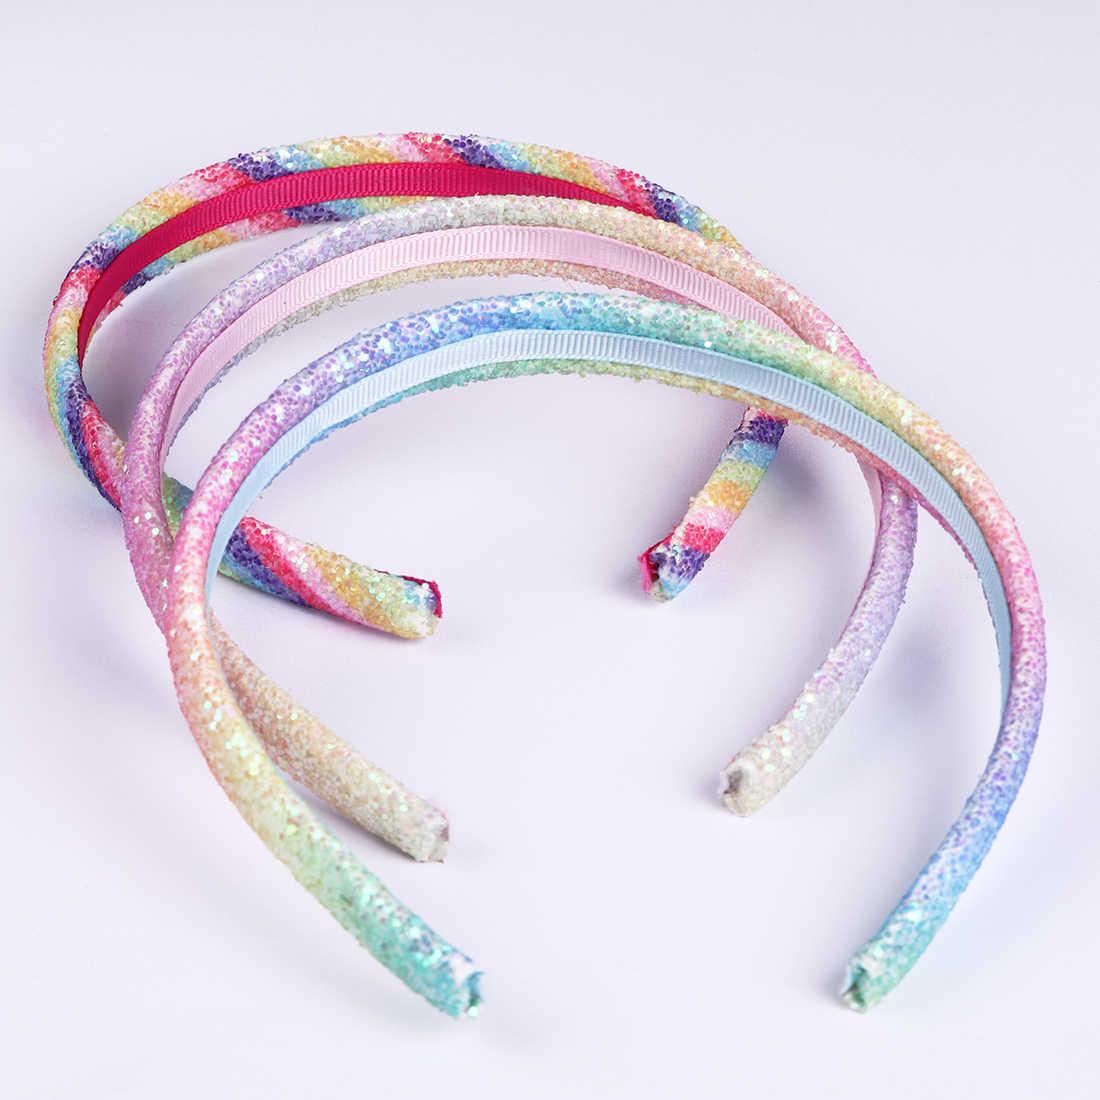 8 Buah/Set Glitter Ikat Kepala Gadis Manis Rambut Wanita Bando Pelangi Payet Dicetak Jantung Anak Aksesoris Rambut